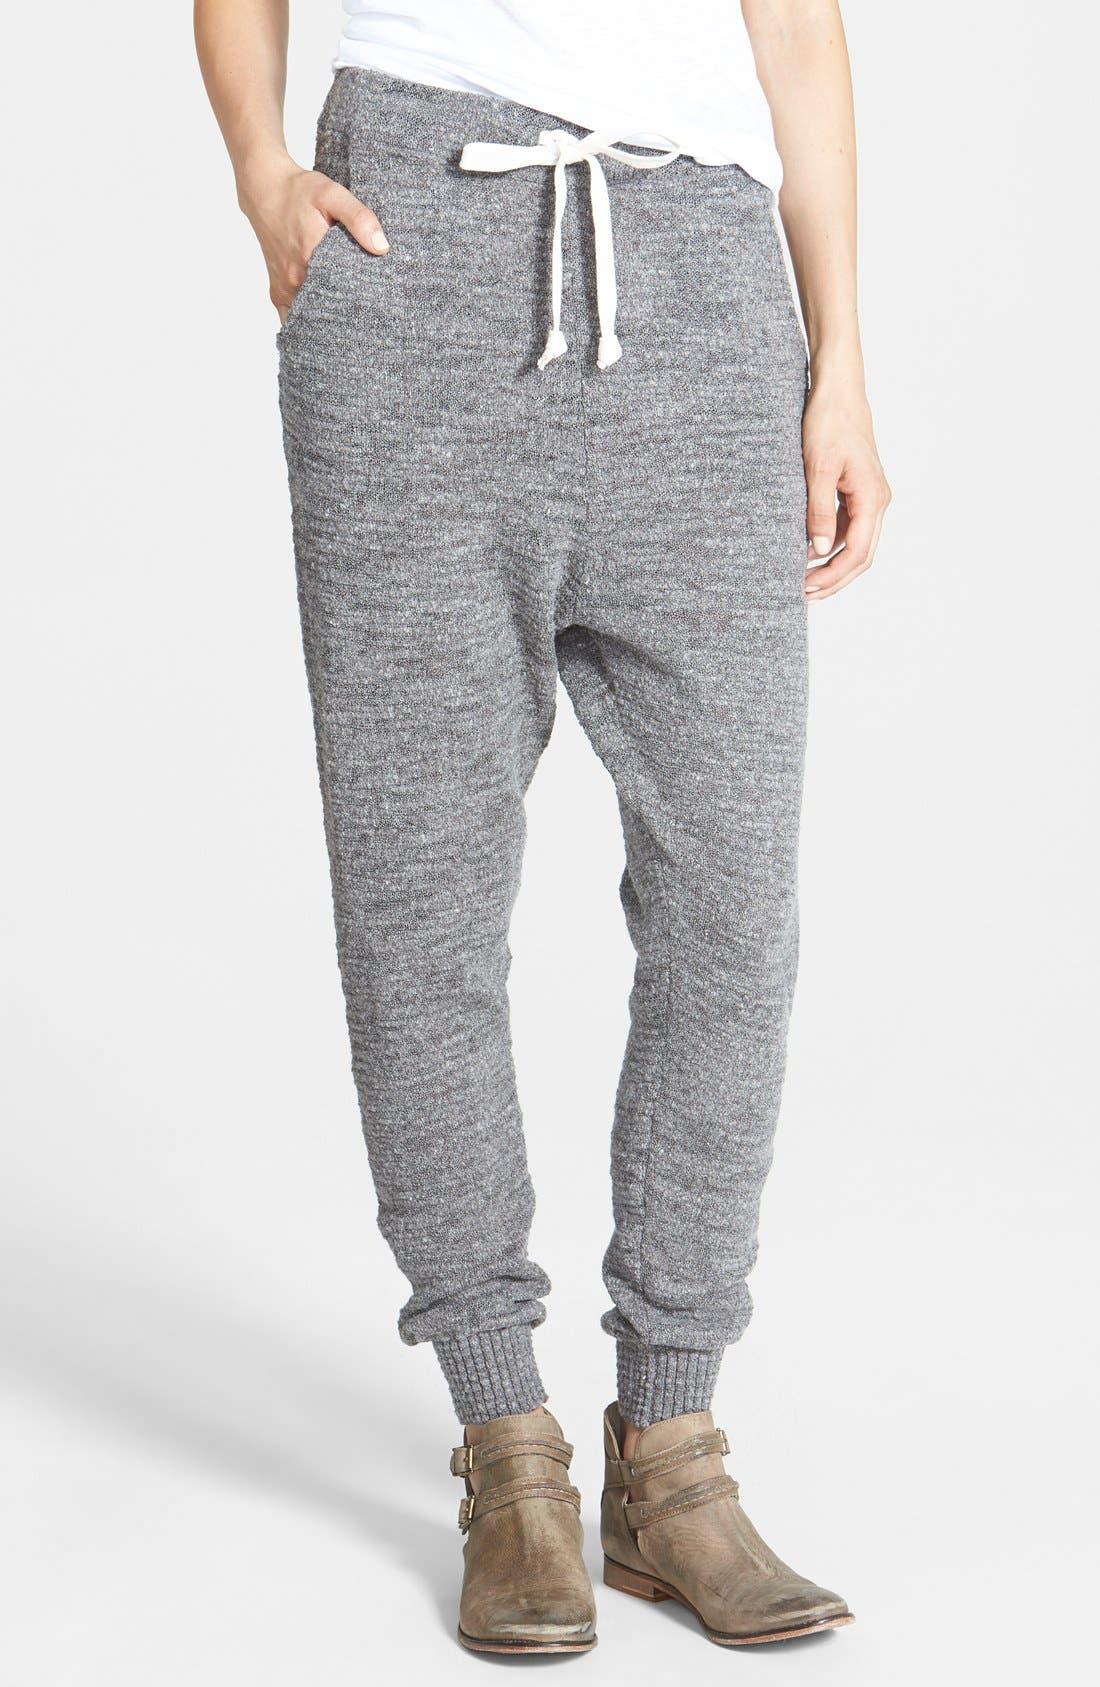 Alternate Image 1 Selected - Free People Sweater Knit Harem Pants